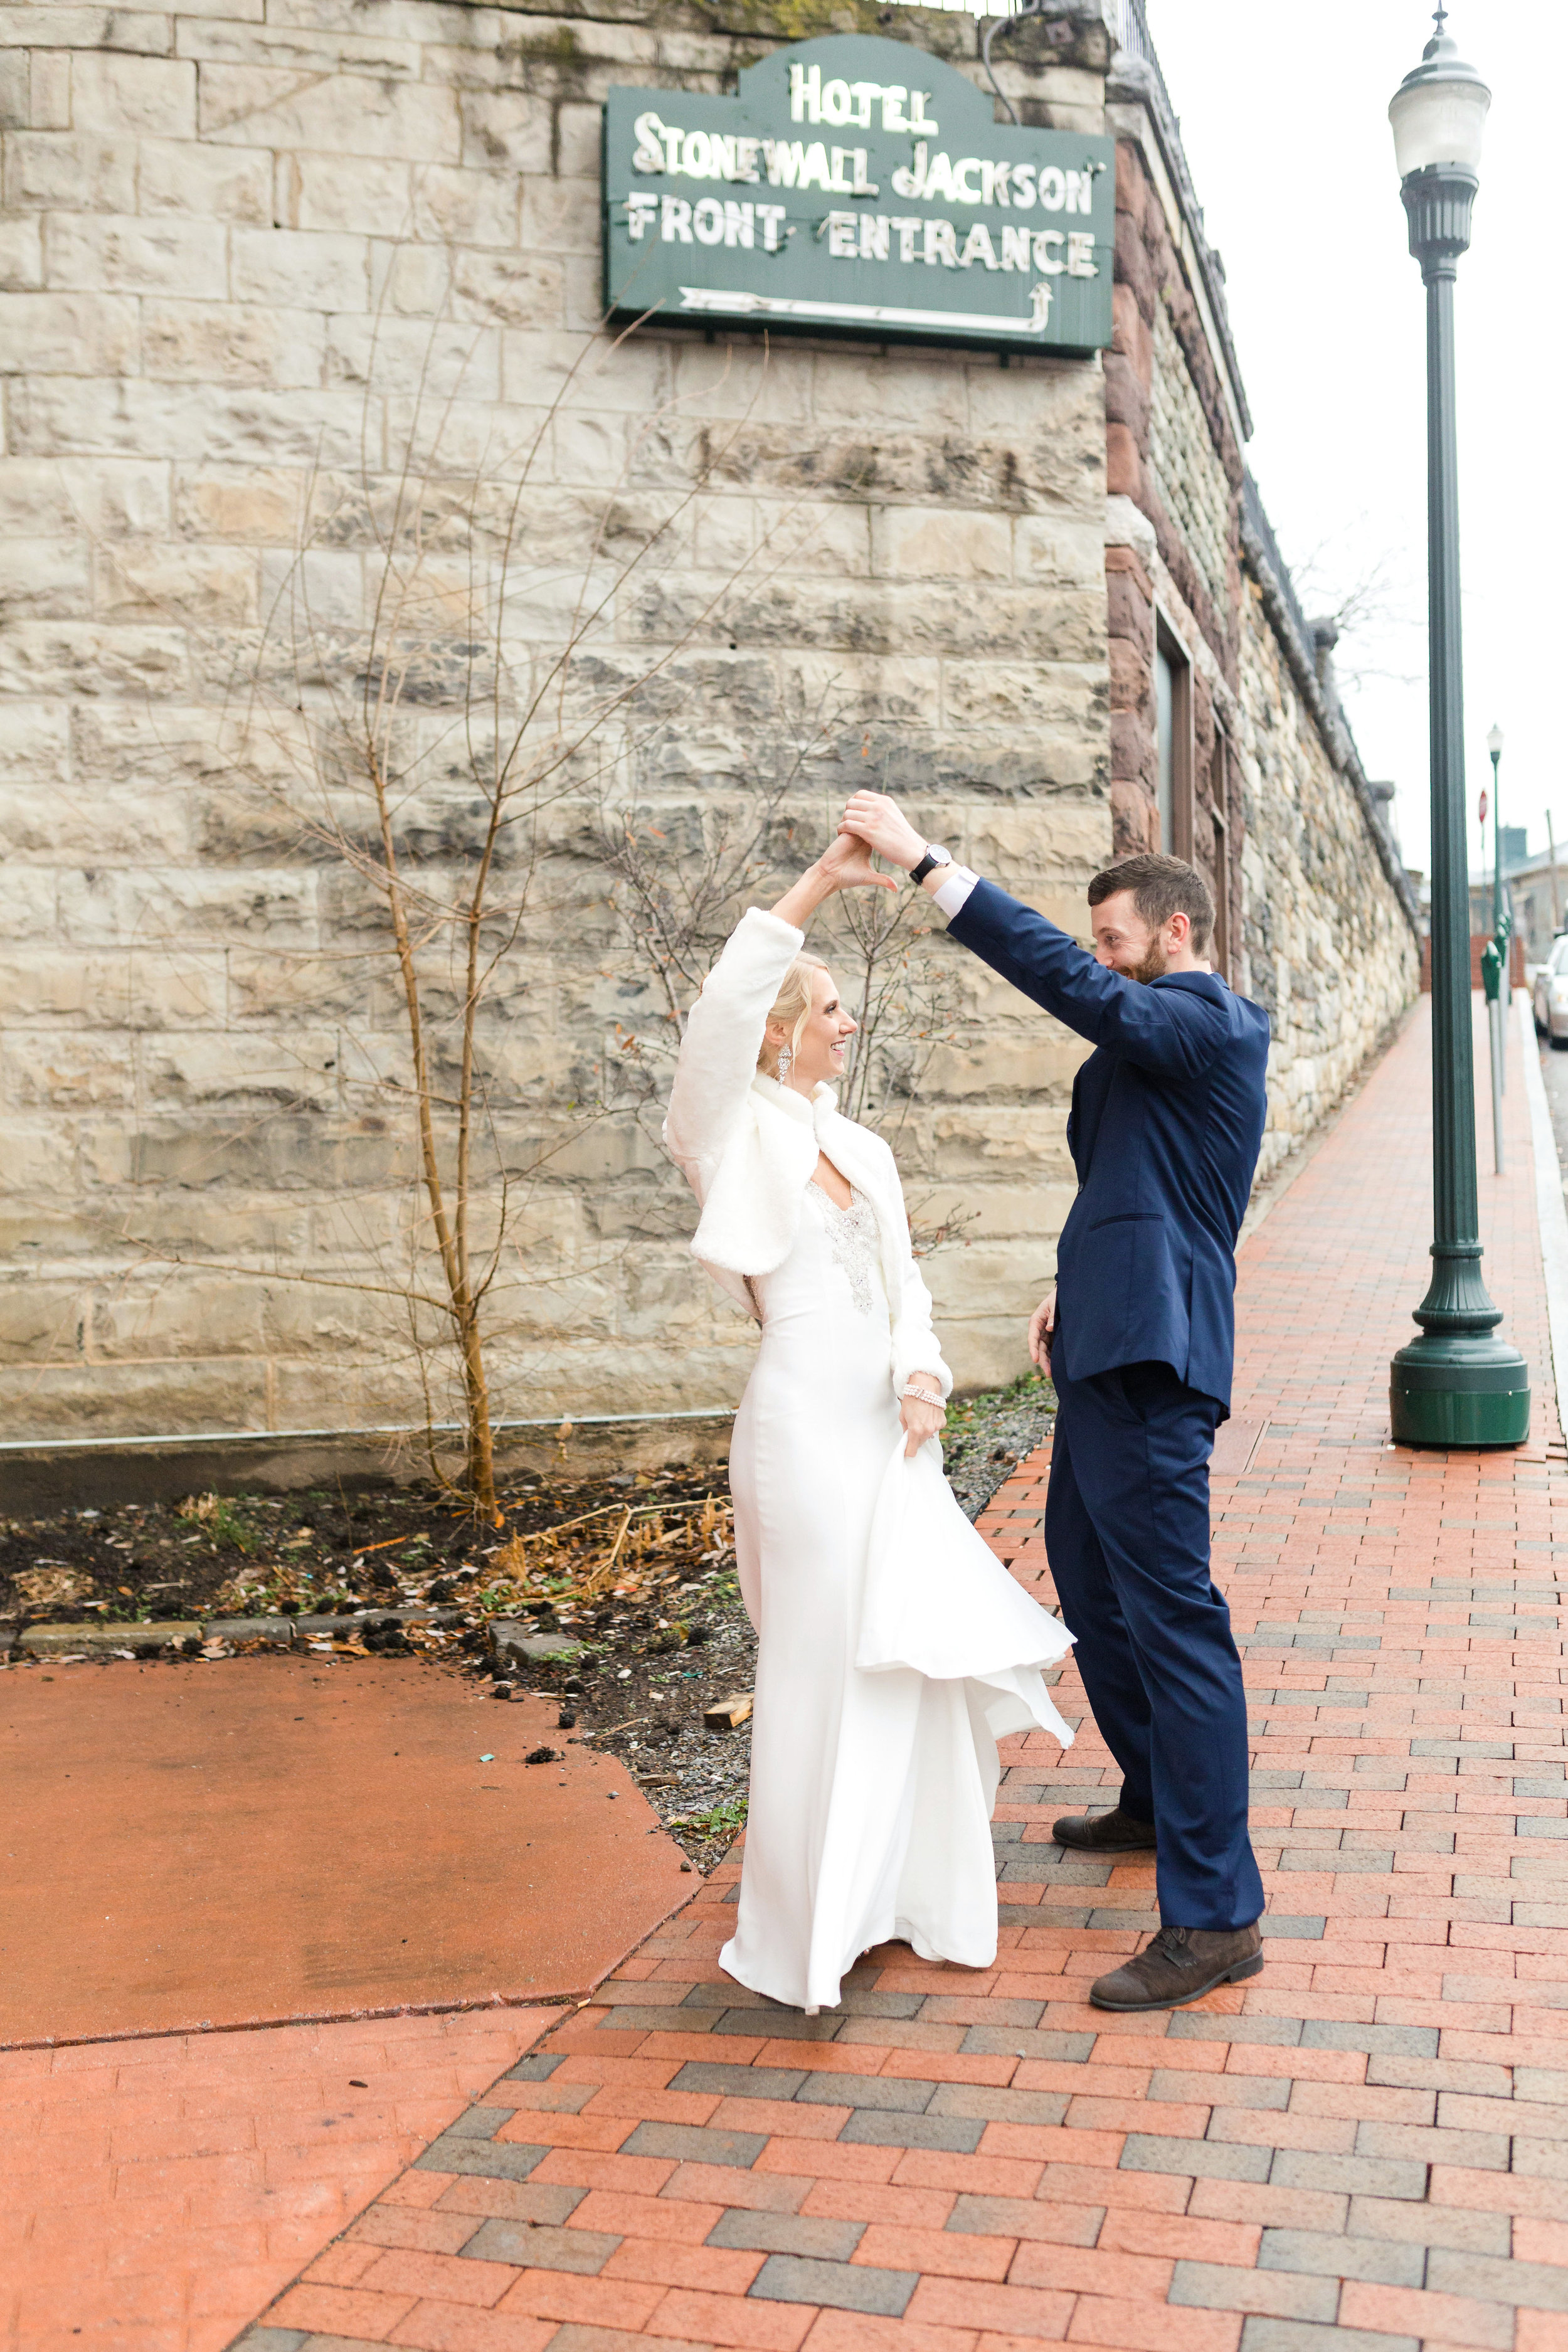 stonewall jackson wedding-58.jpg